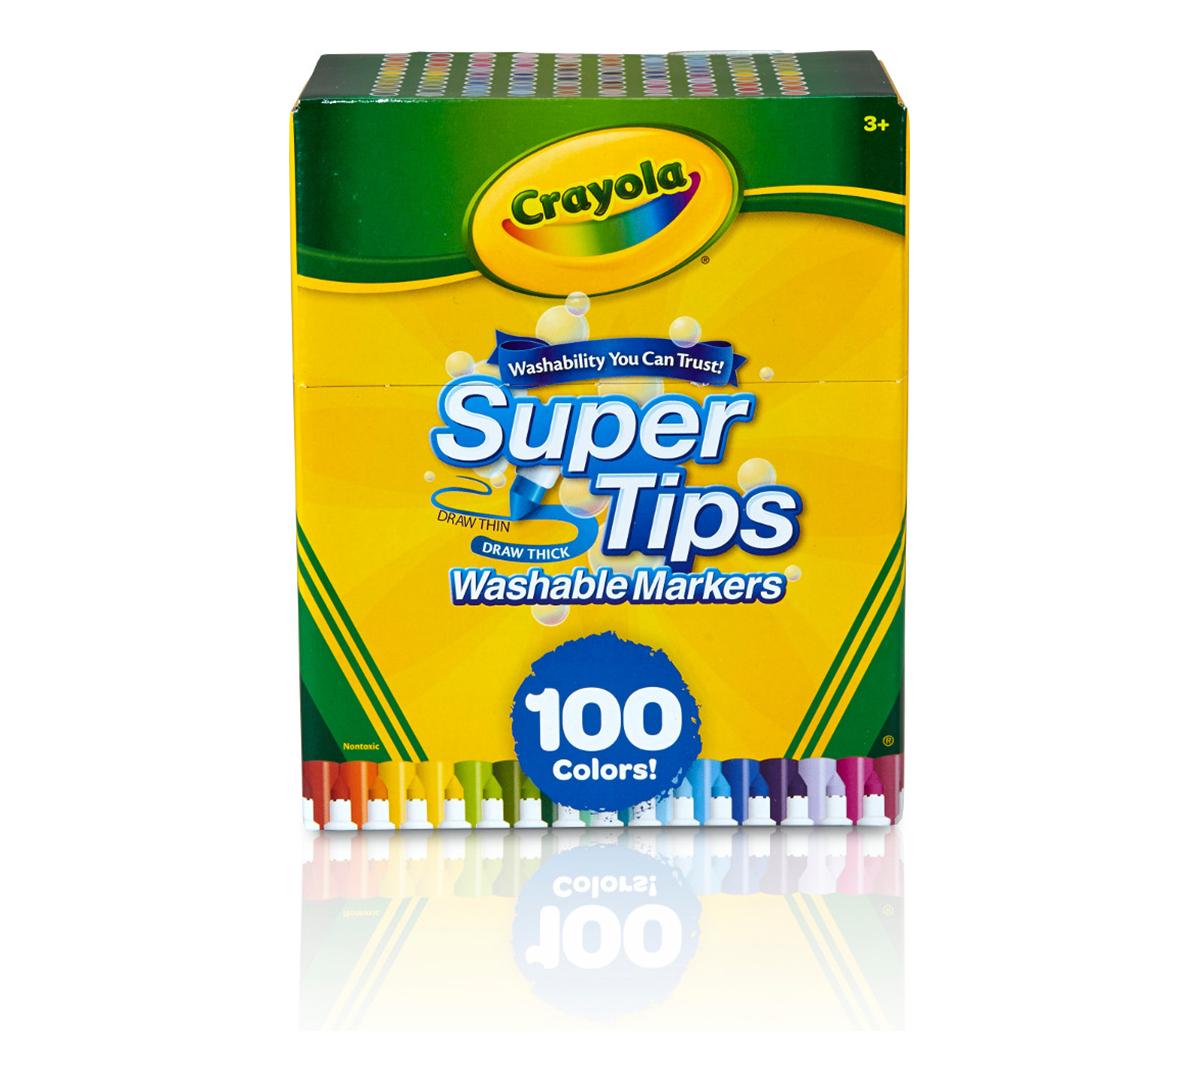 Super Tips Washable Markers, 100 Count Bulk   Crayola.com